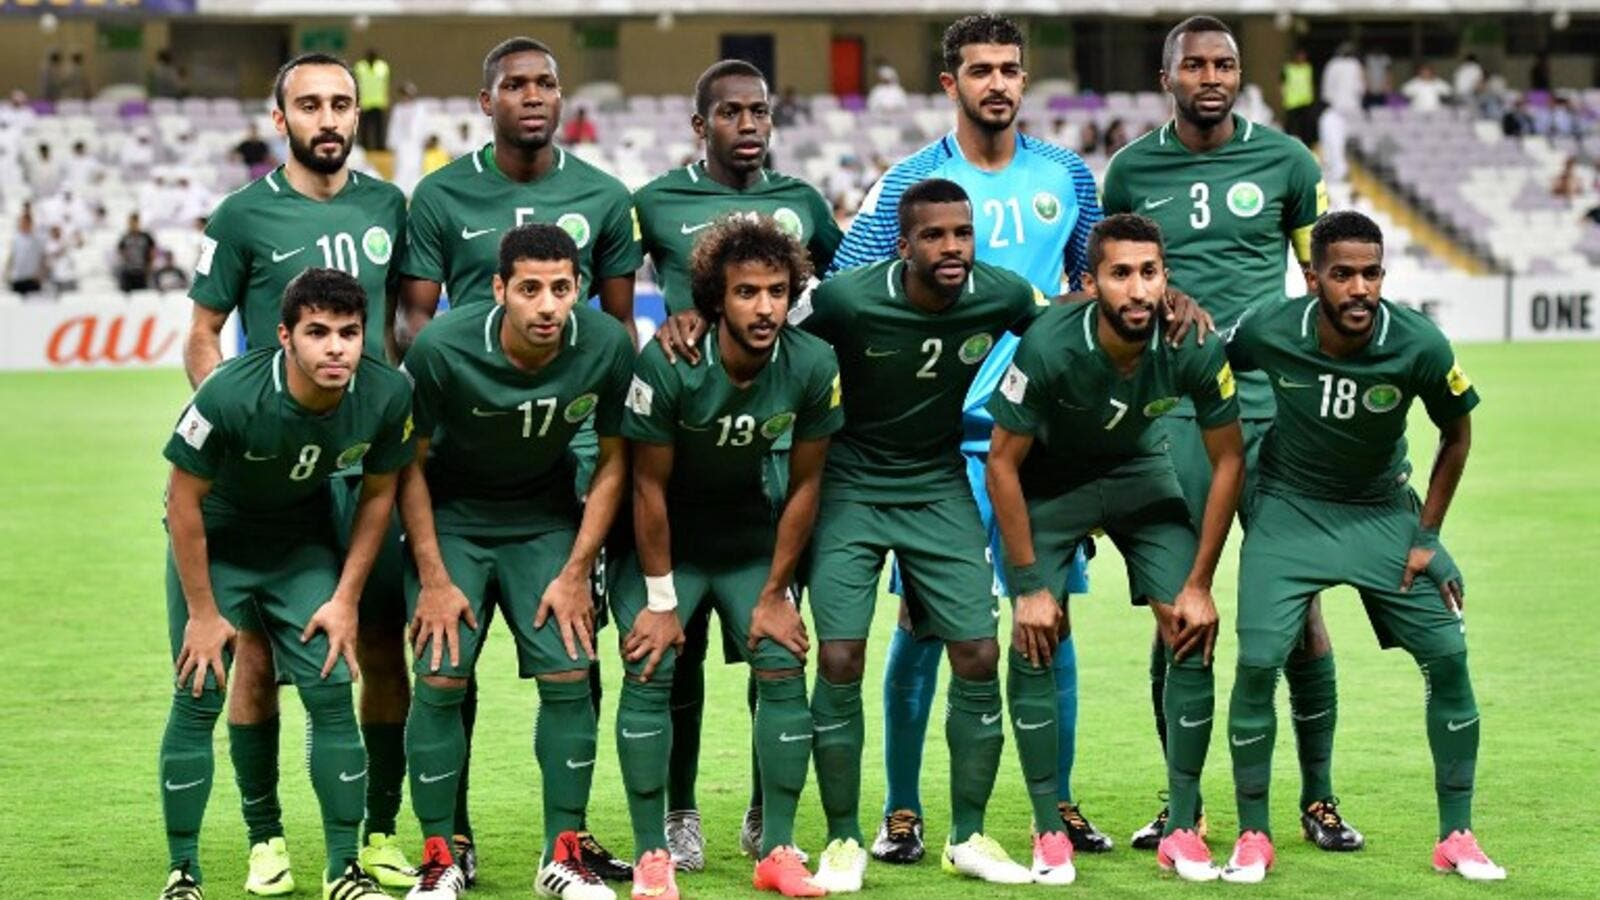 Fifa world cup  player list all team